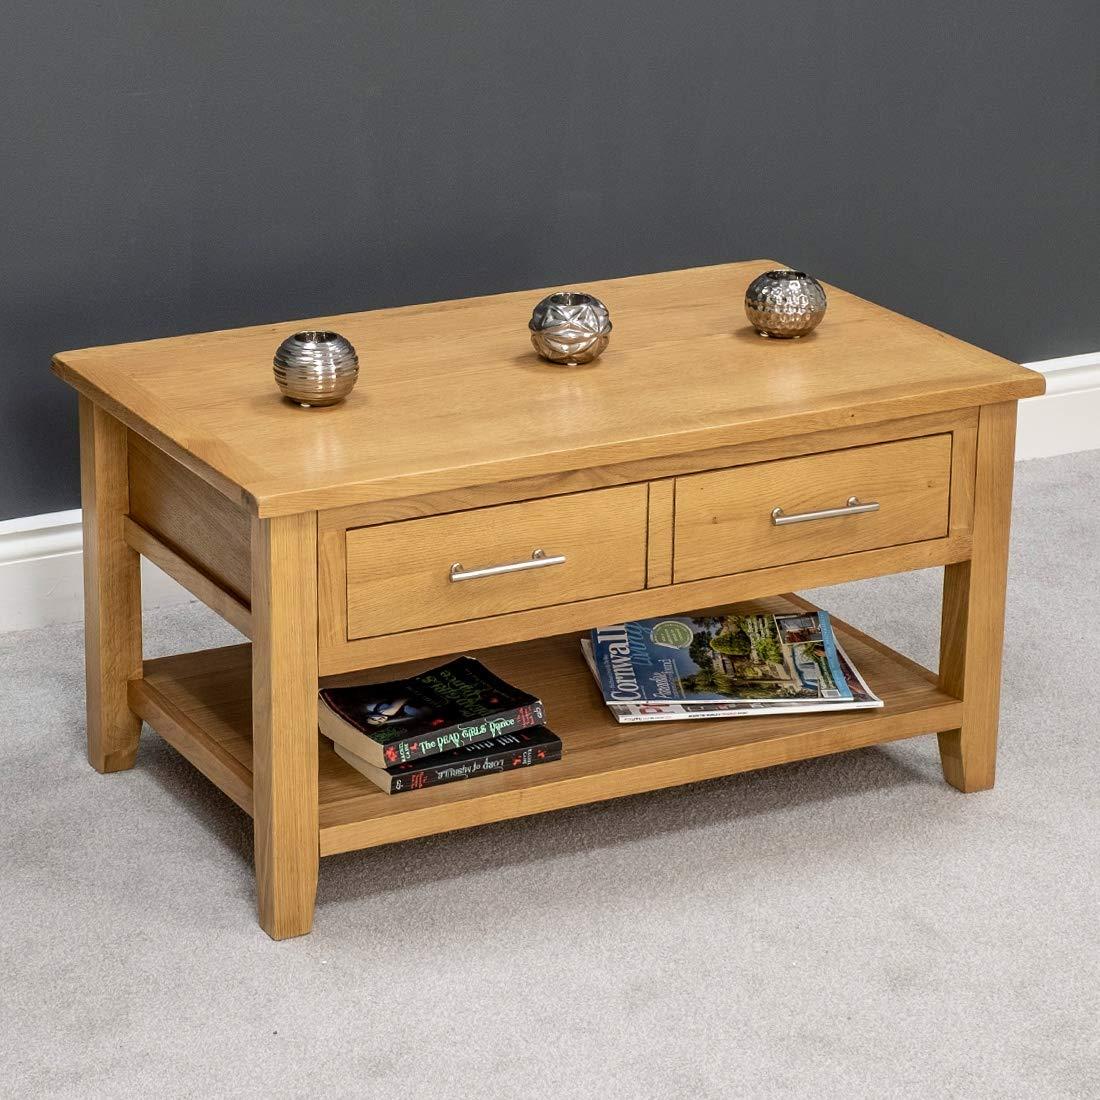 Ayfee Nebraska Modern Oak 1 Drawer Coffee Table Storage With Shelf